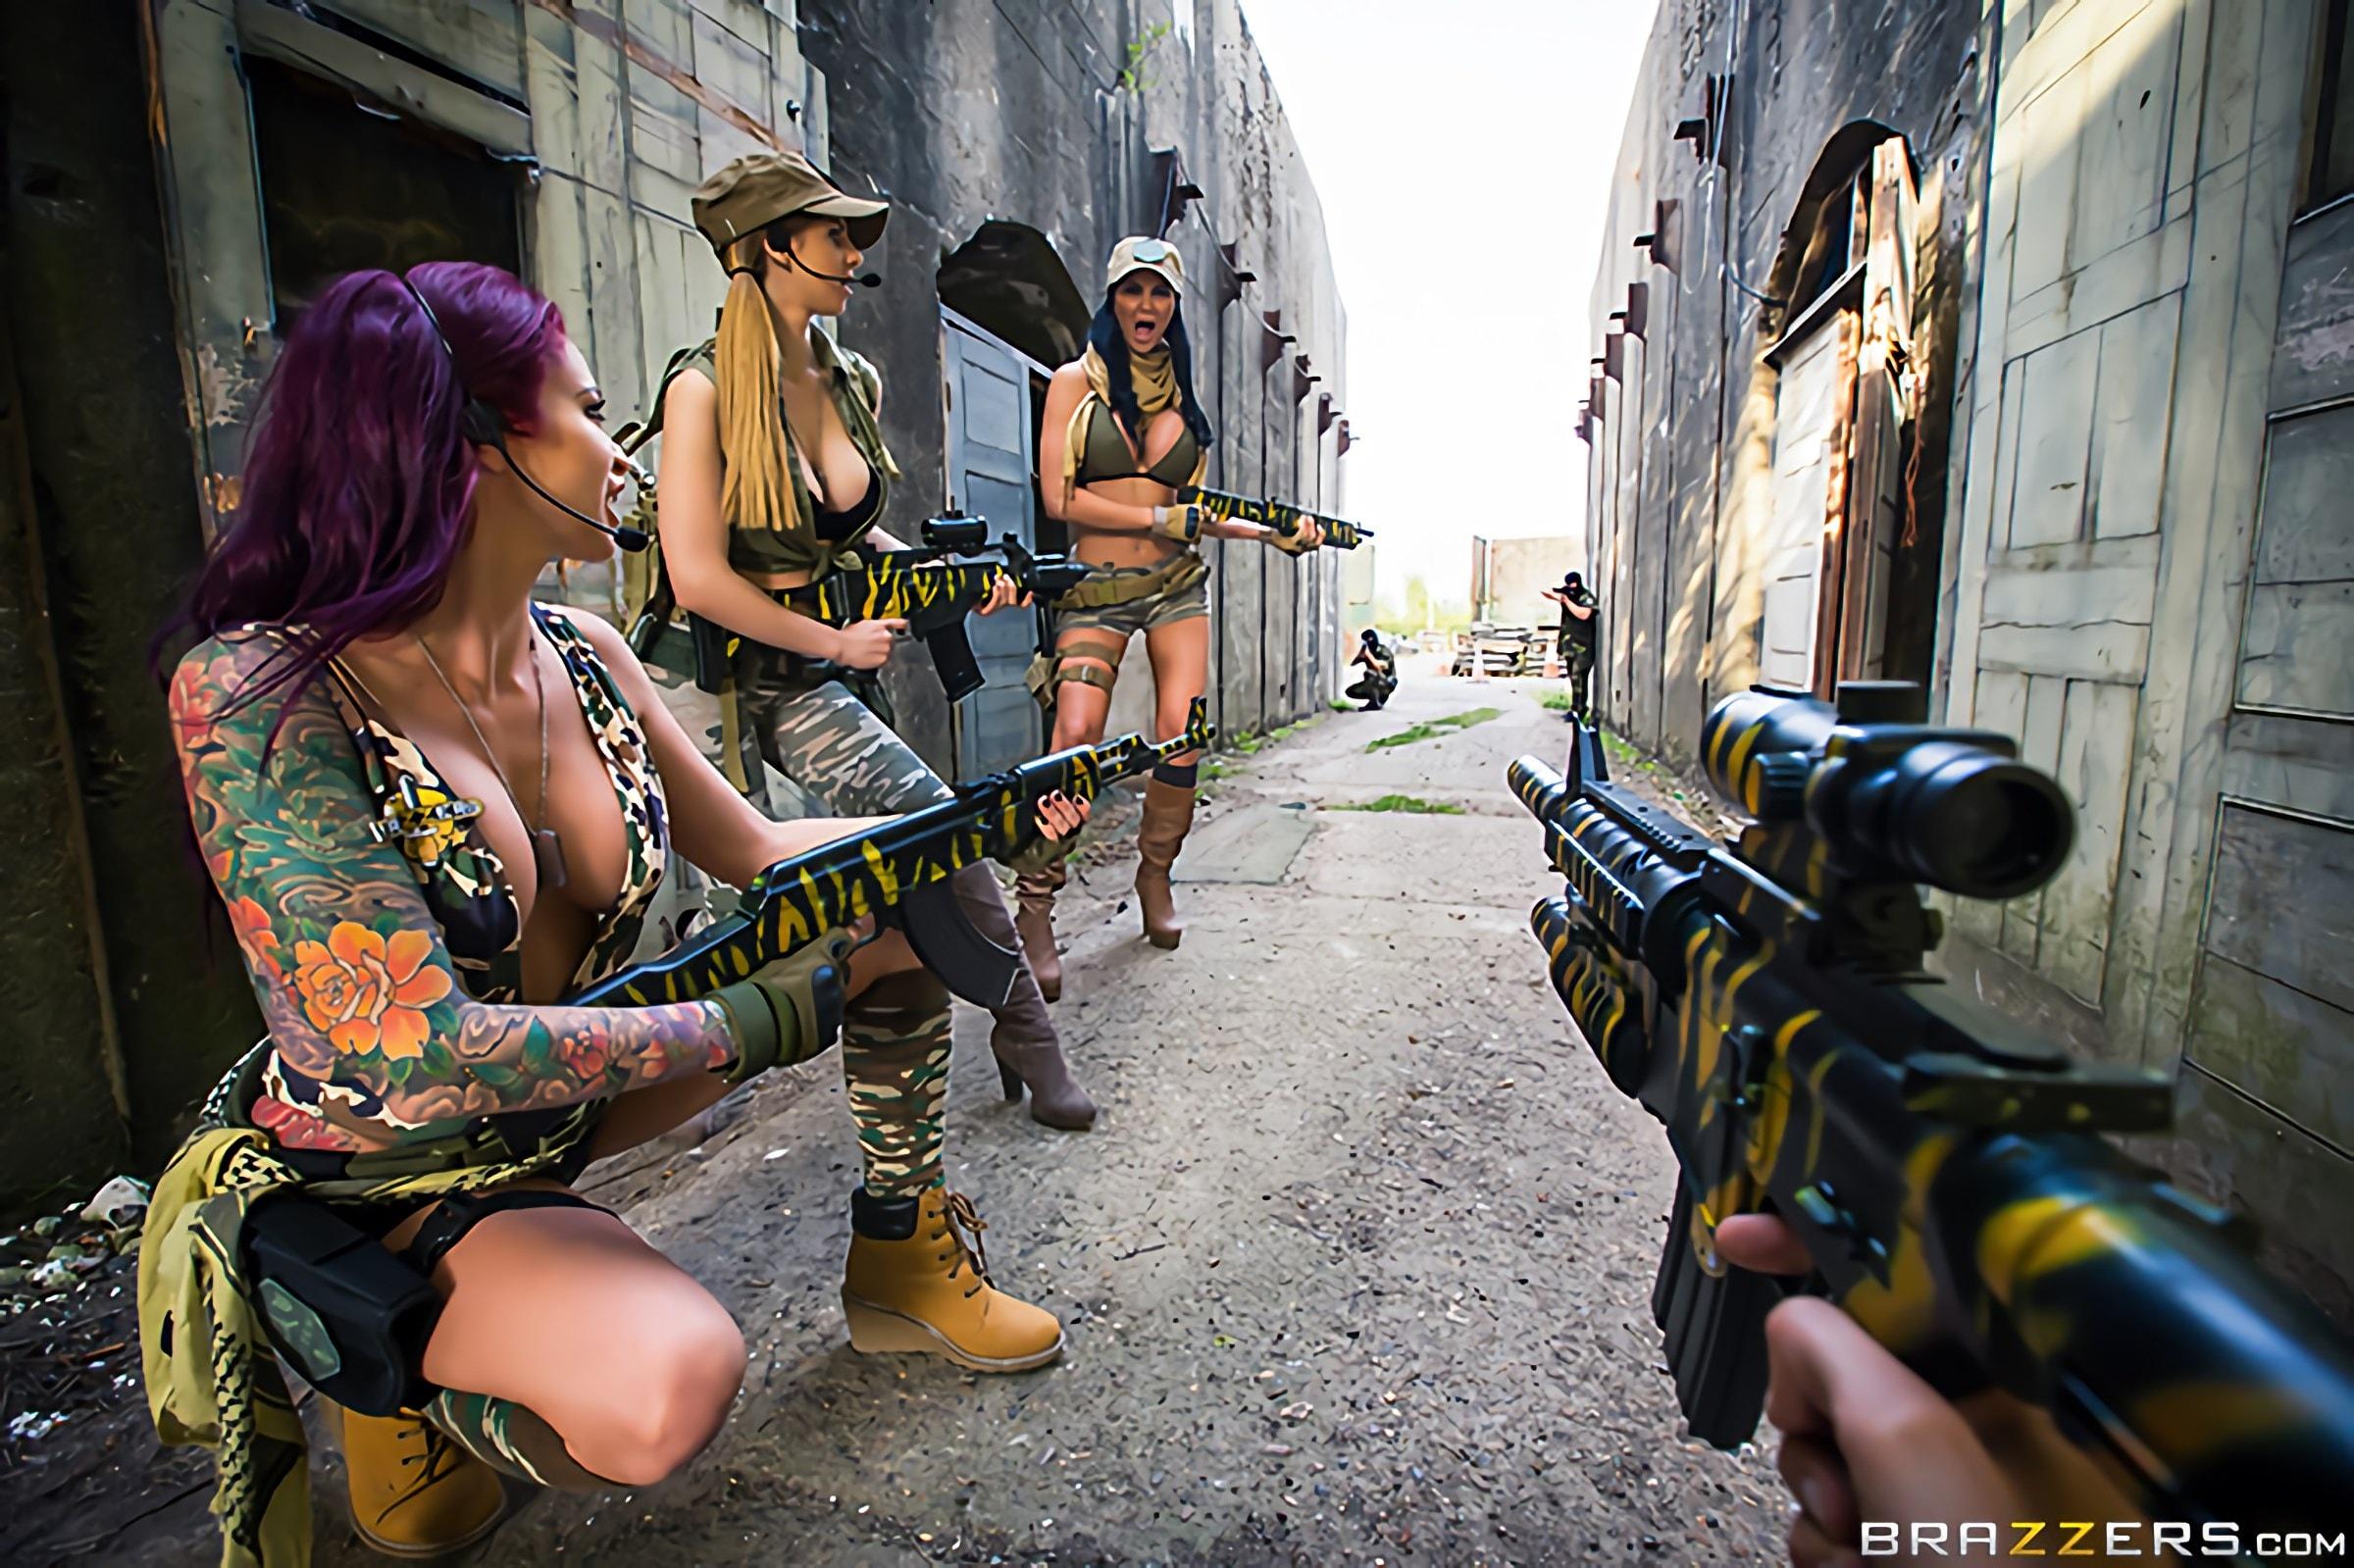 Brazzers 'Cock Of Duty- A XXX Parody' starring Monique Alexander (Photo 1)